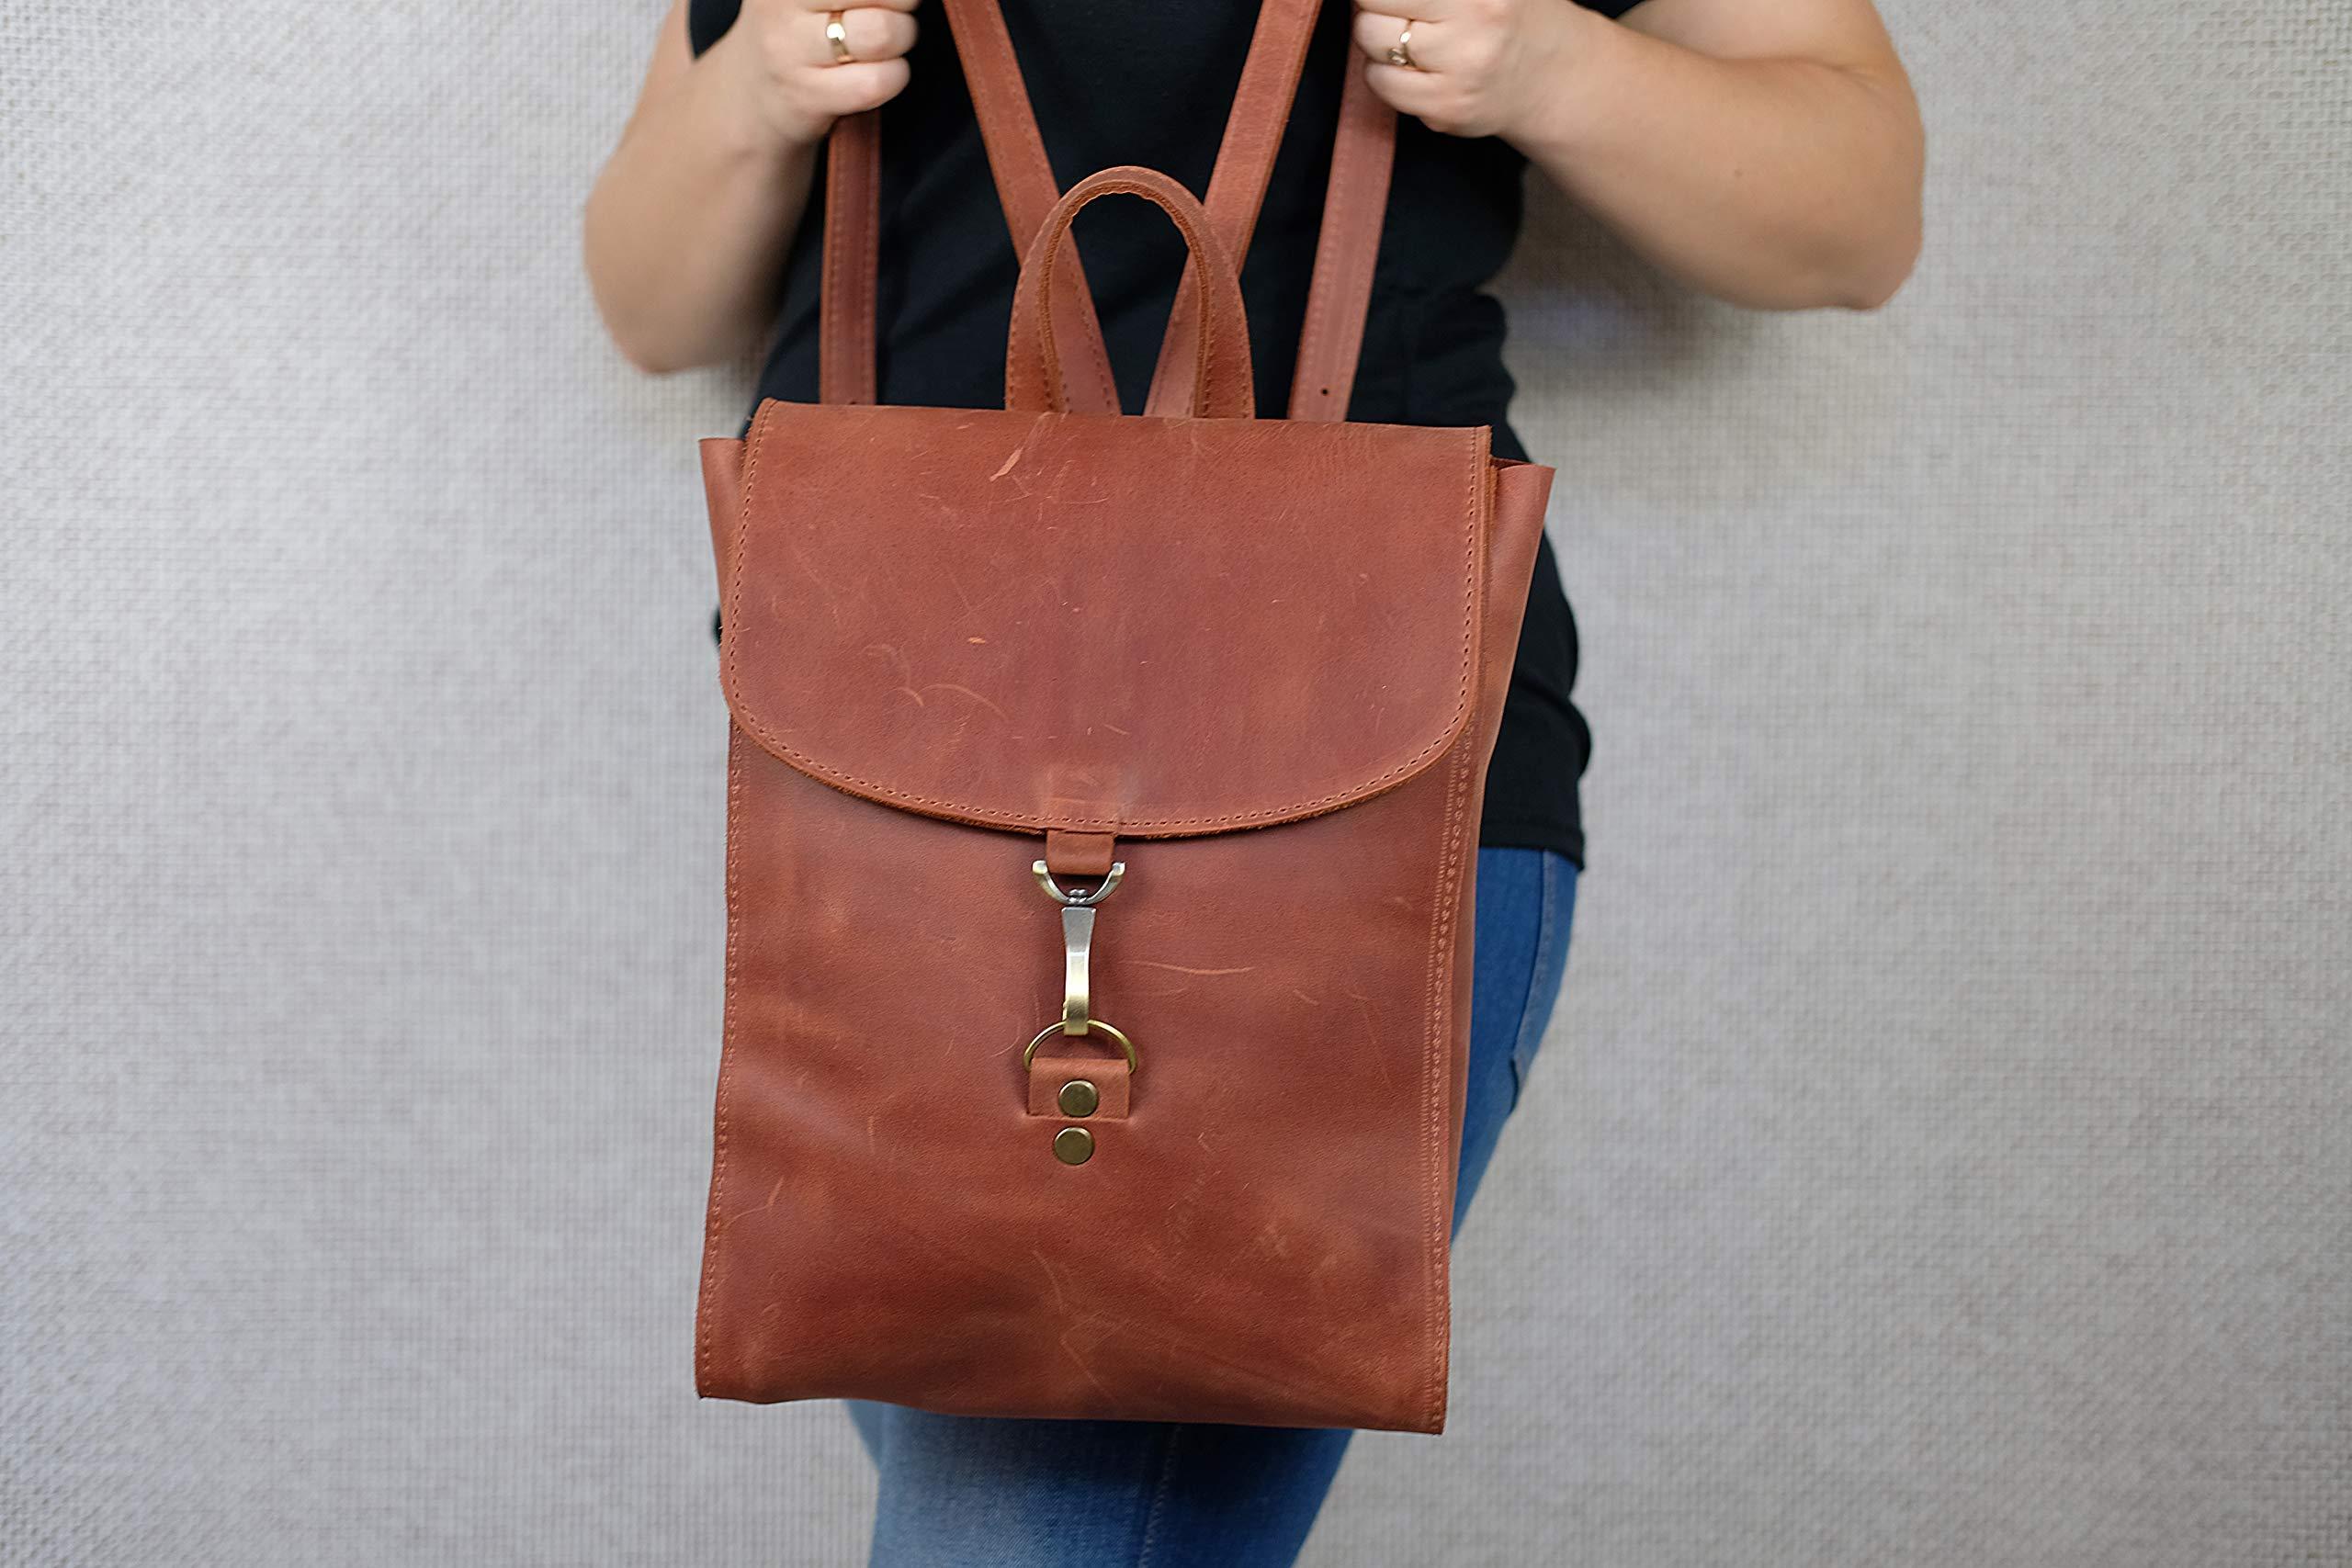 Leather backpack, Women backpack, Leather backpack women, Brown women backpack, Gift anniversary, Shoulder Bag, Monogram, Work, Handbag 12.6 x 9.5 inch